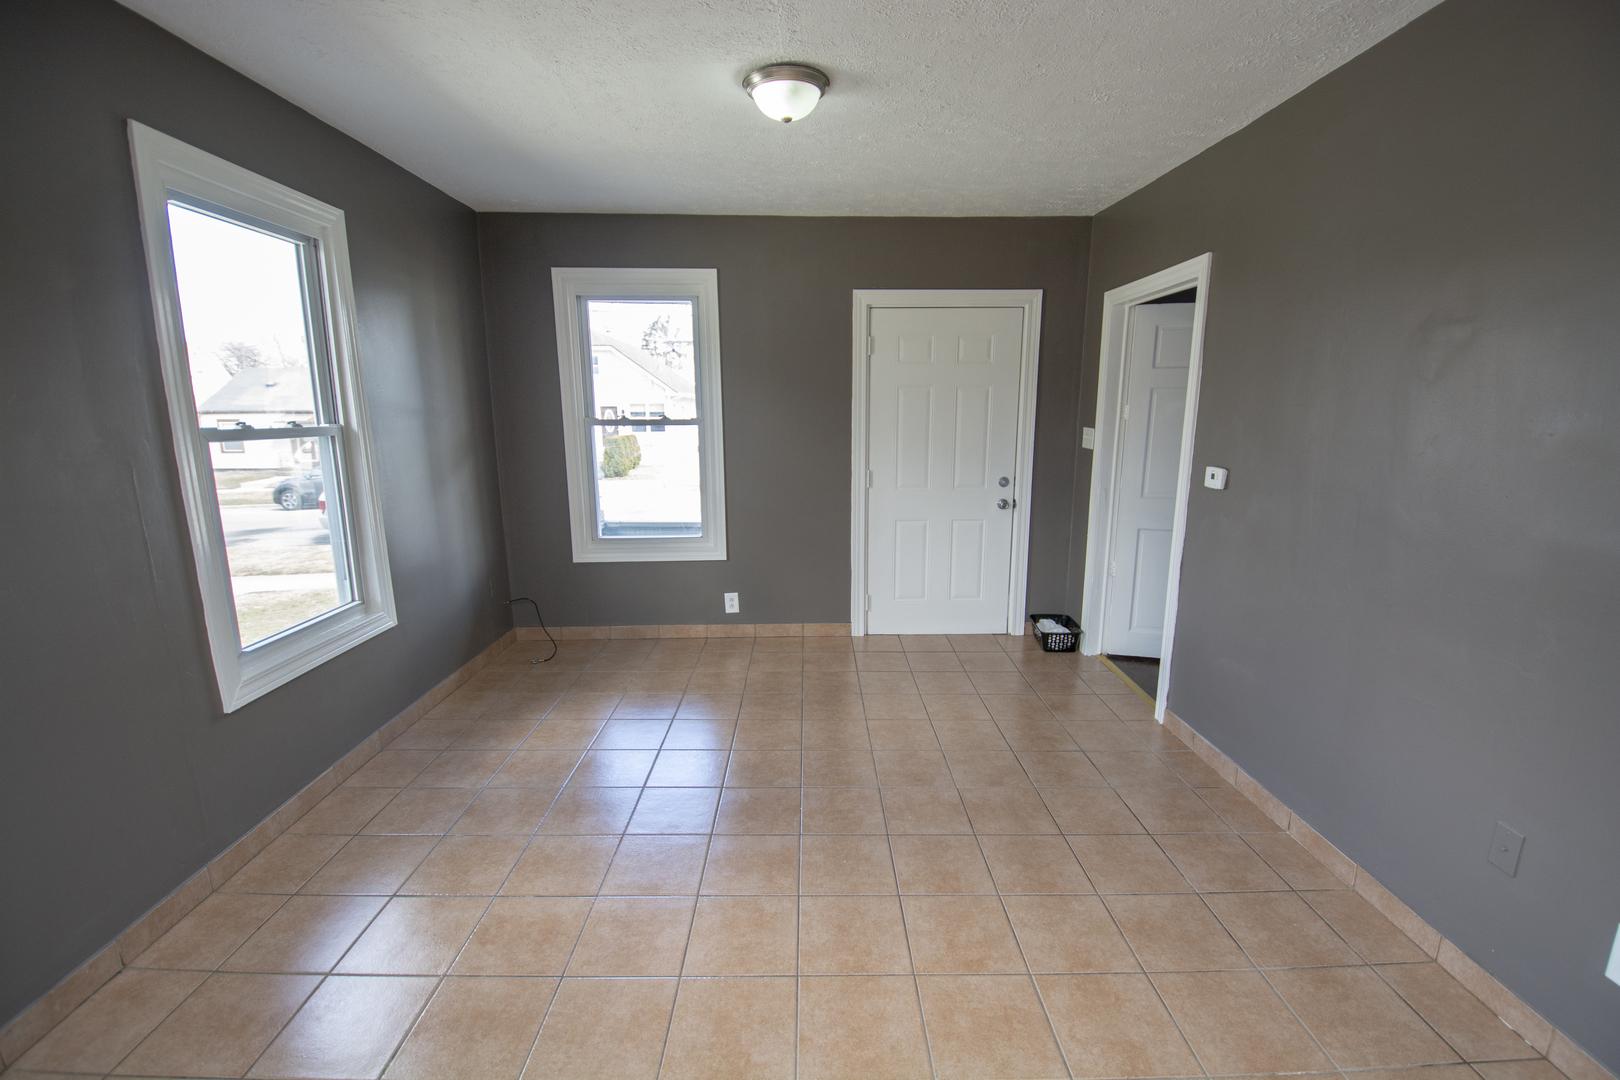 817 KANE, AURORA, Illinois, 60505